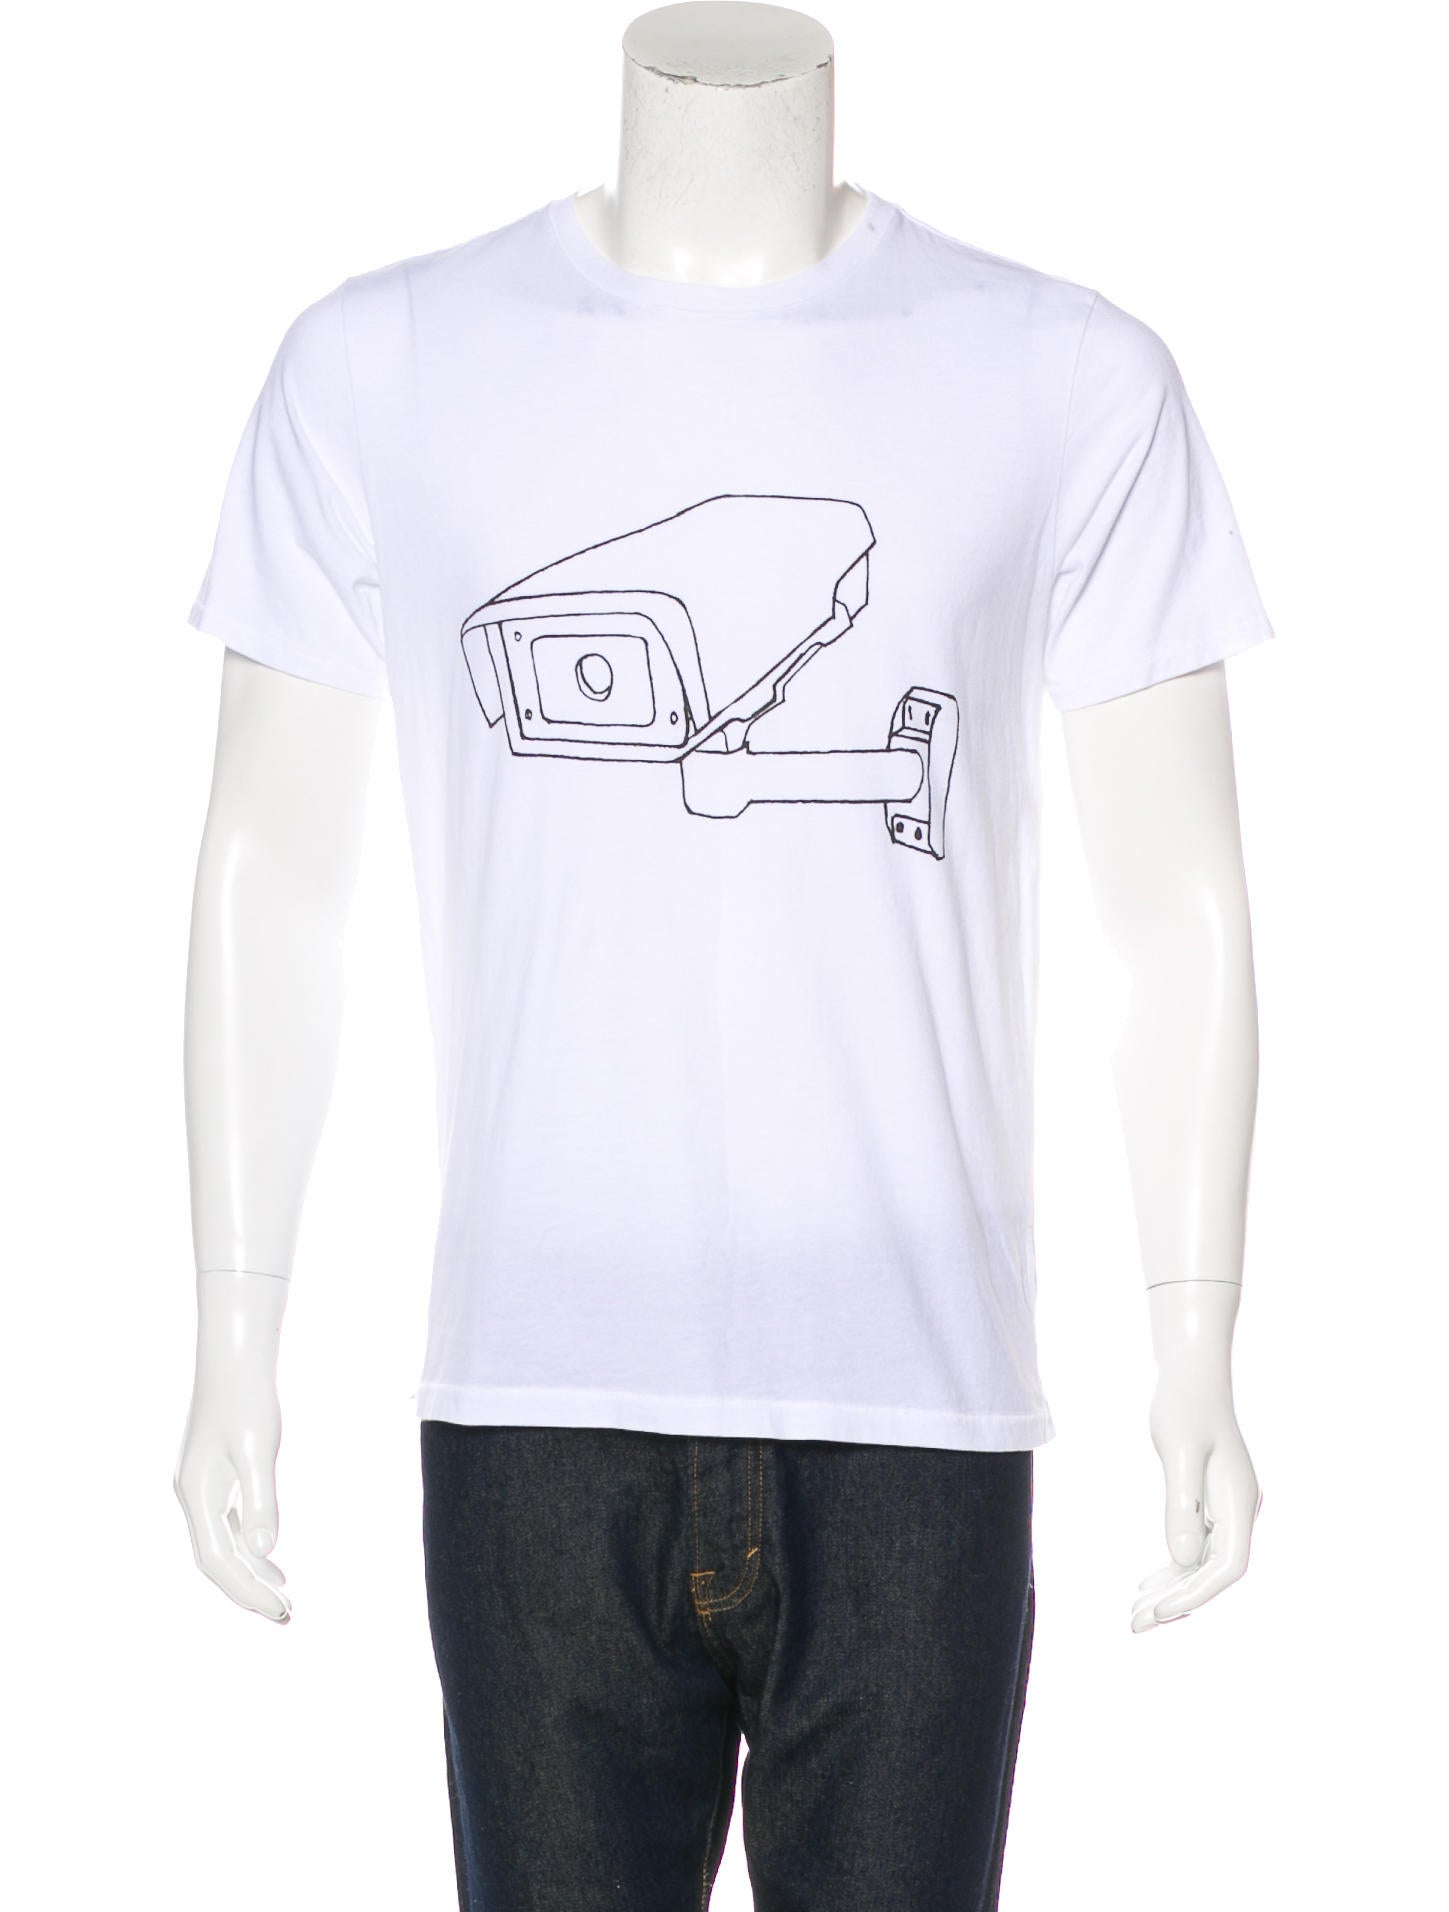 Rag bone graphic t shirt clothing wragb84152 the for Rag and bone t shirts